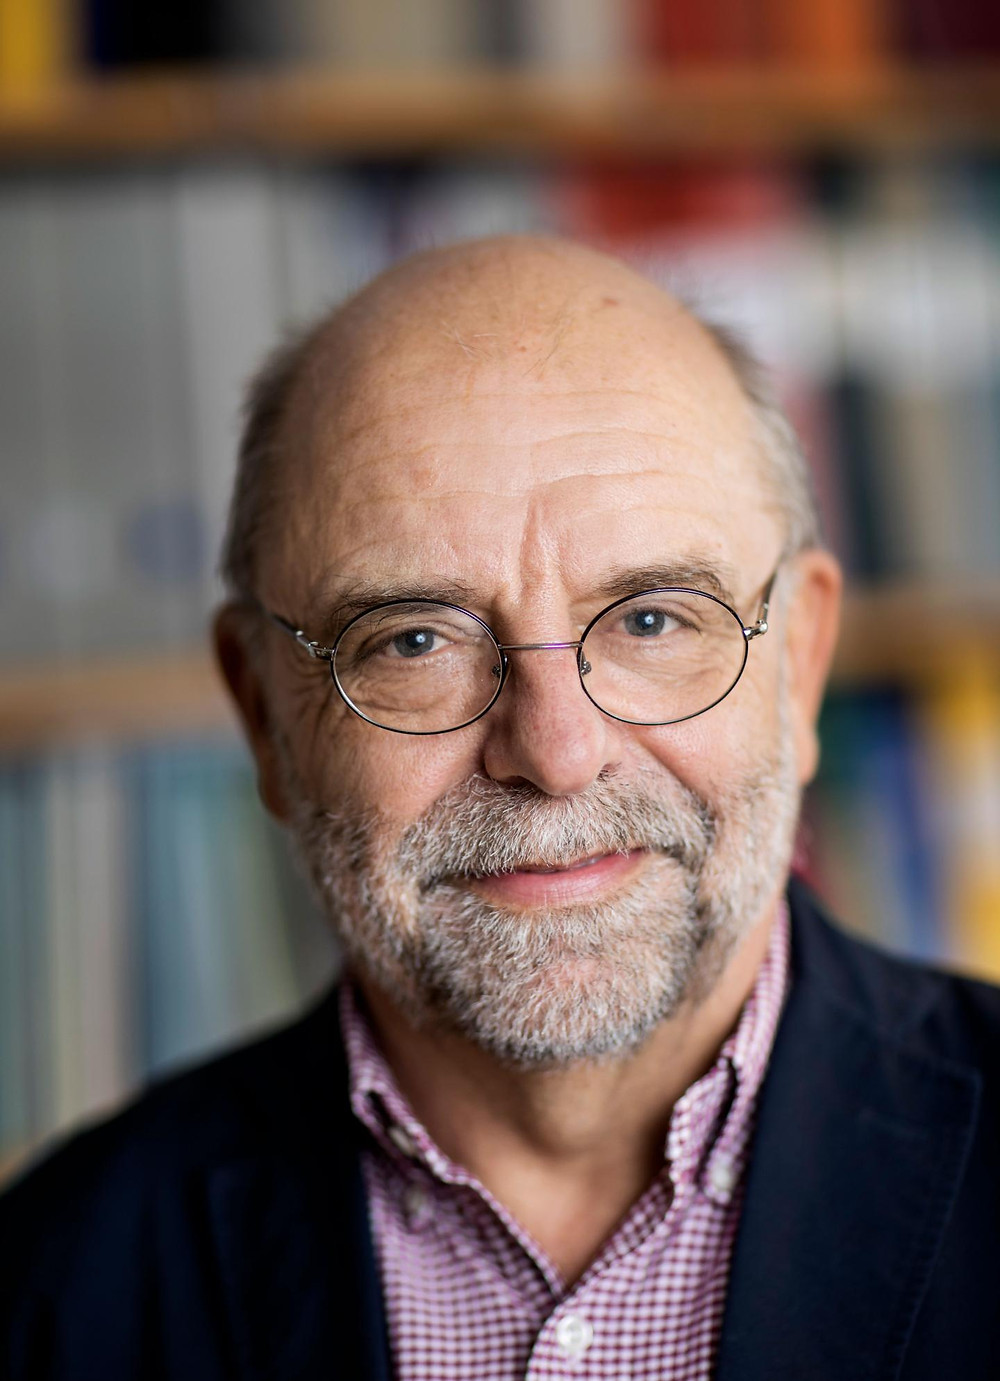 IMAGE: THIS IS GUNNAR C. HANSSON, PROFESSOR OF MEDICAL BIOCHEMISTRY AT SAHLGRENSKA ACADEMY, UNIVERSITY OF GOTHENBURG